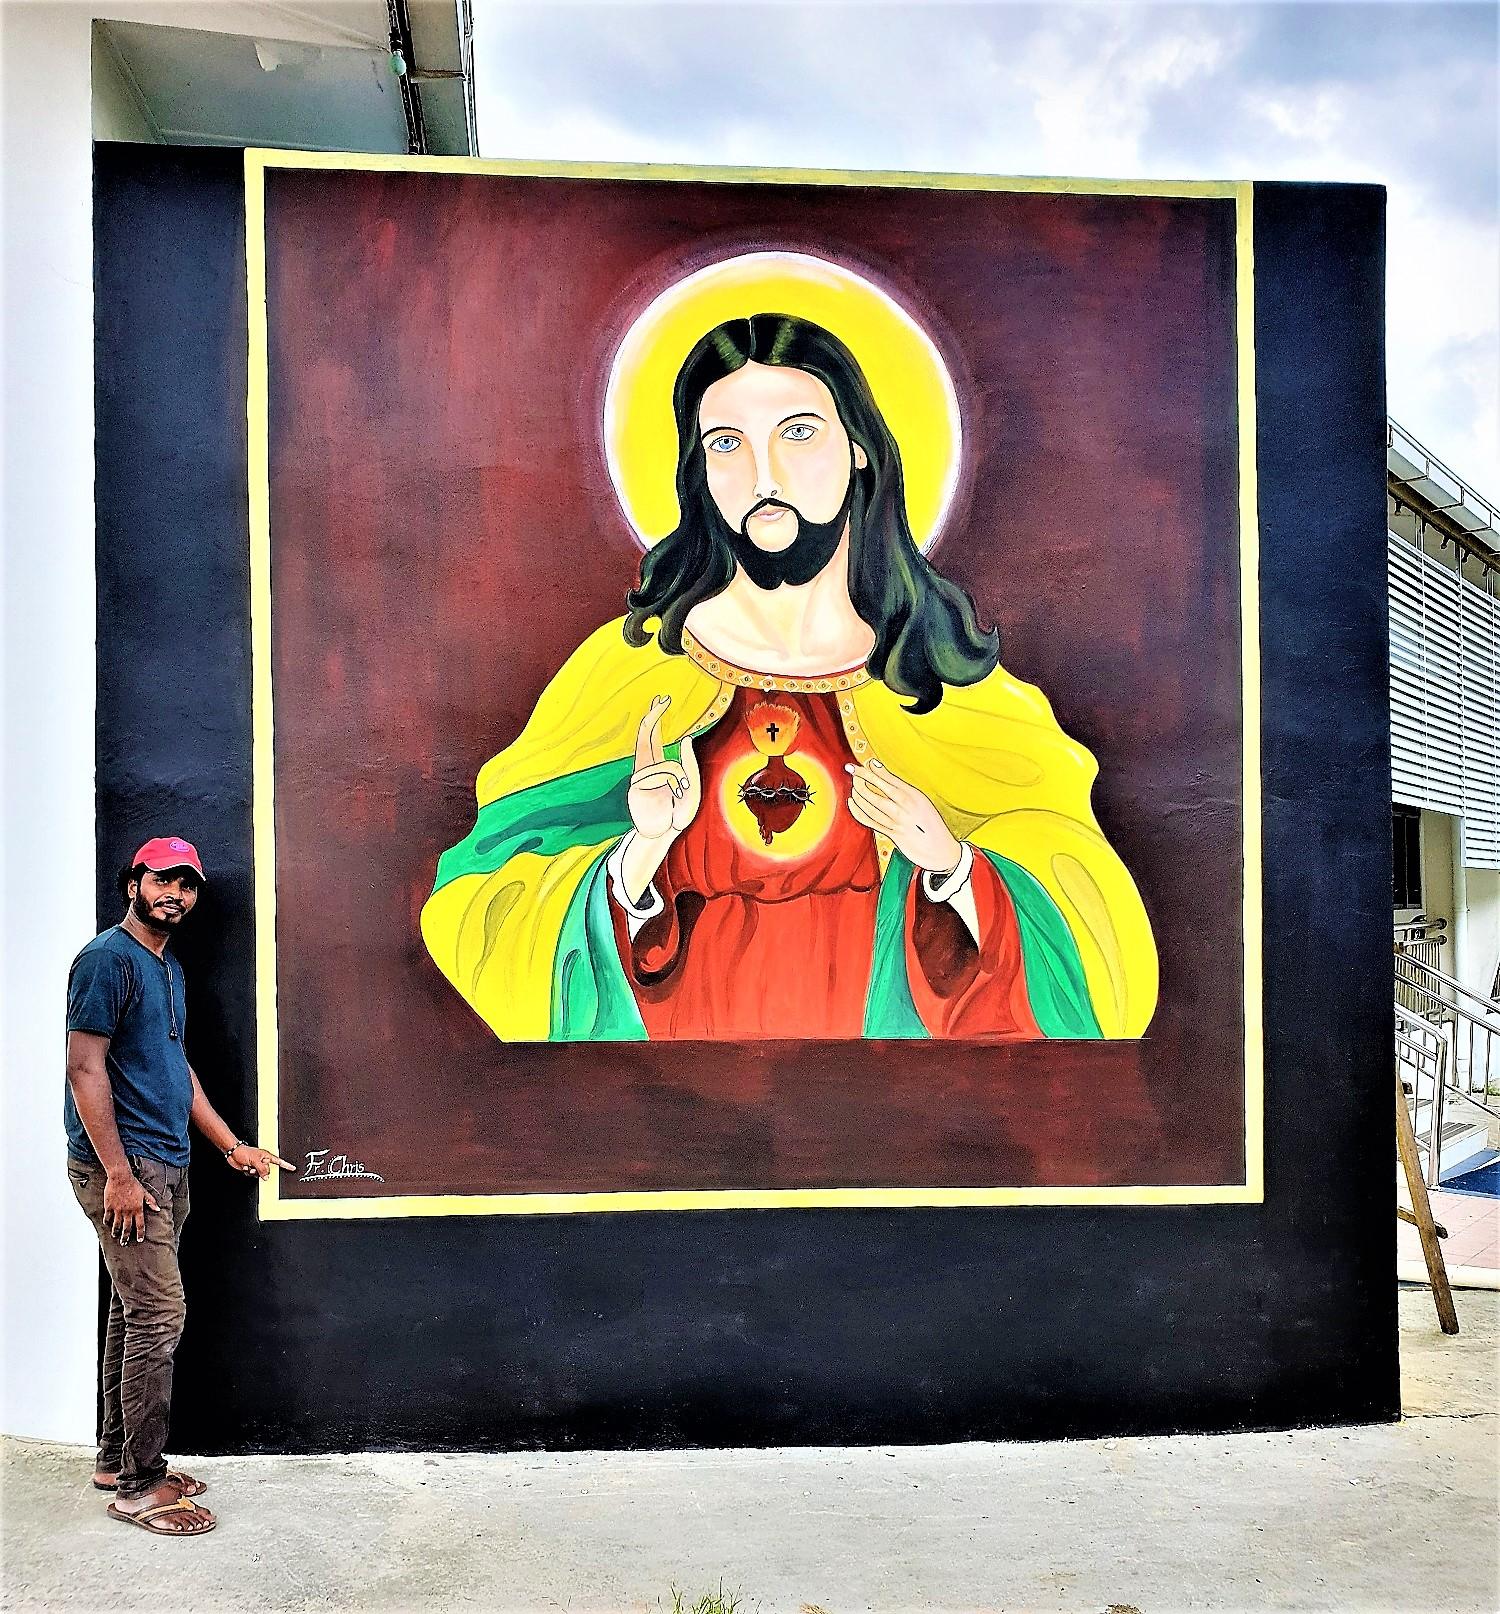 Limbang, Malaysia: Say it with Art